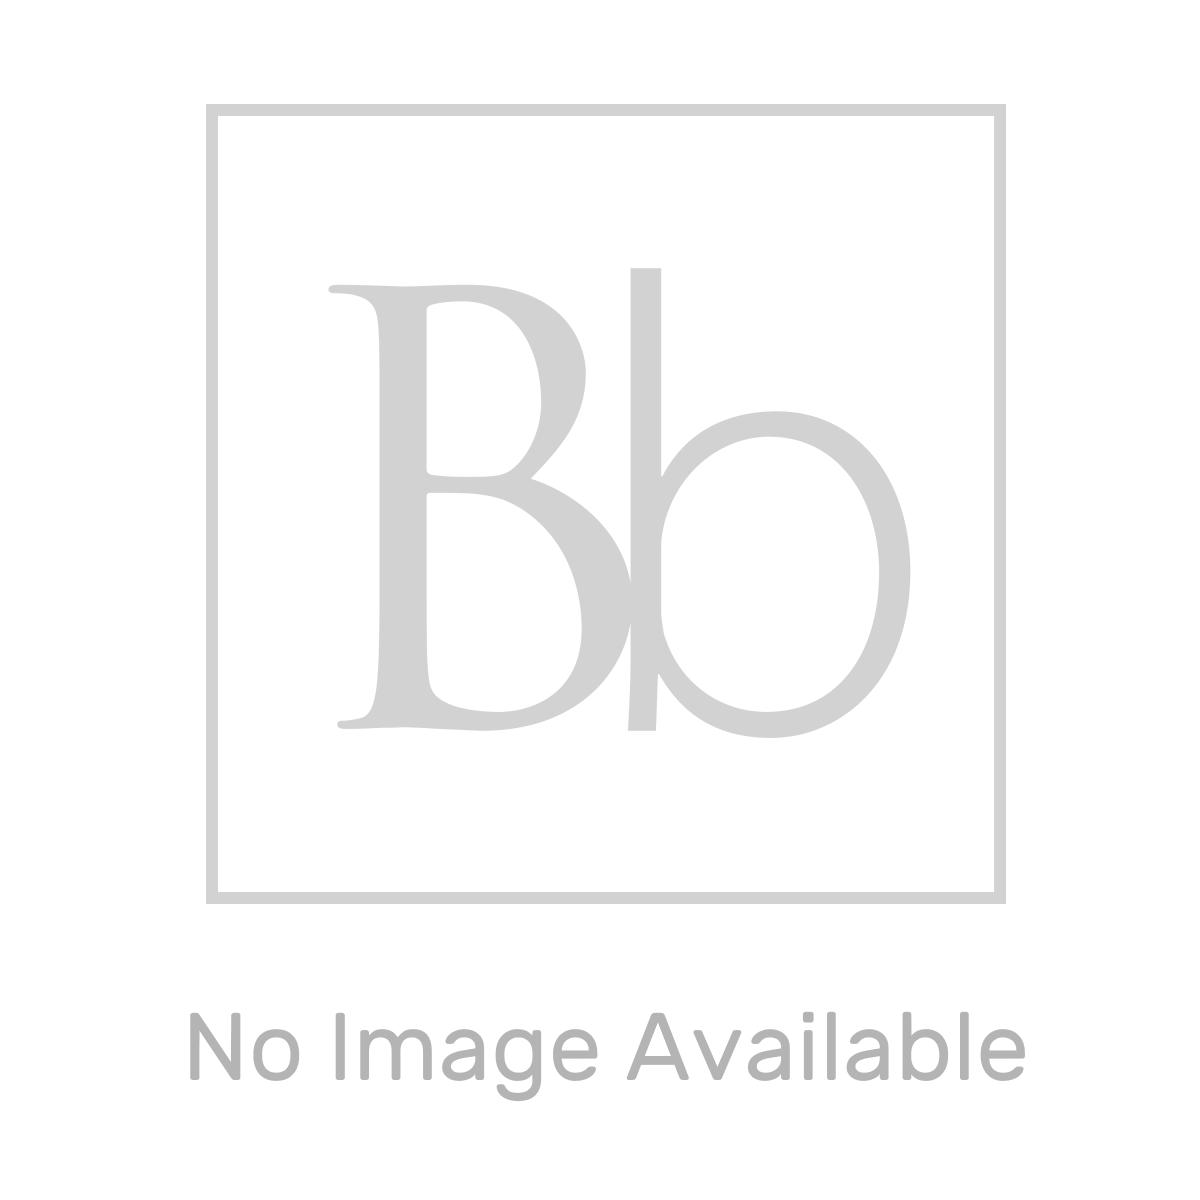 Aquadart Rectangular 900 x 700 Shower Tray